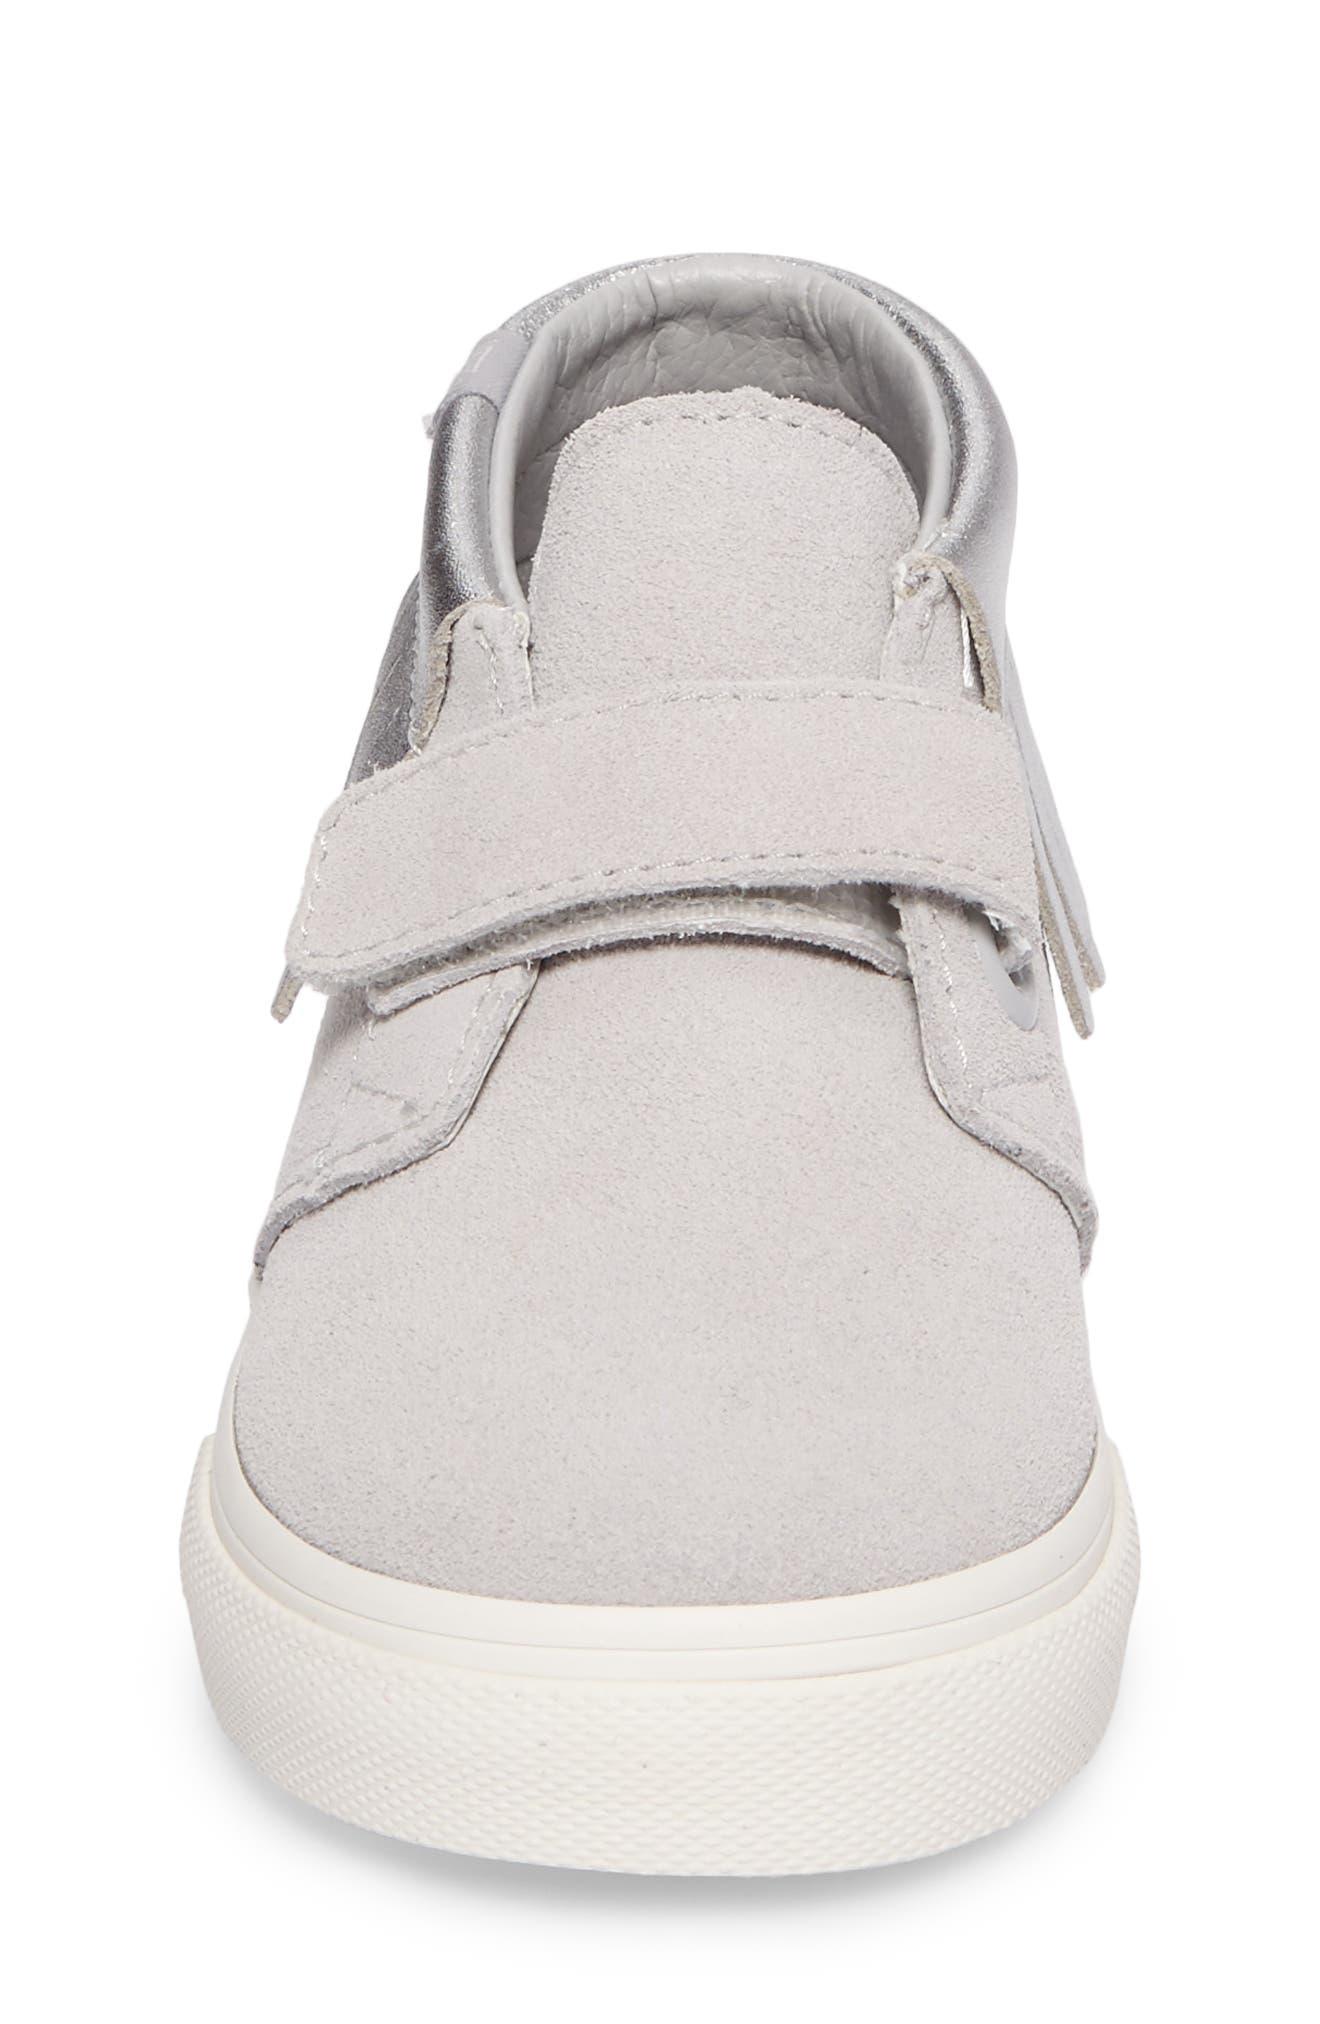 Chukka V Moc Sneaker,                             Alternate thumbnail 4, color,                             040